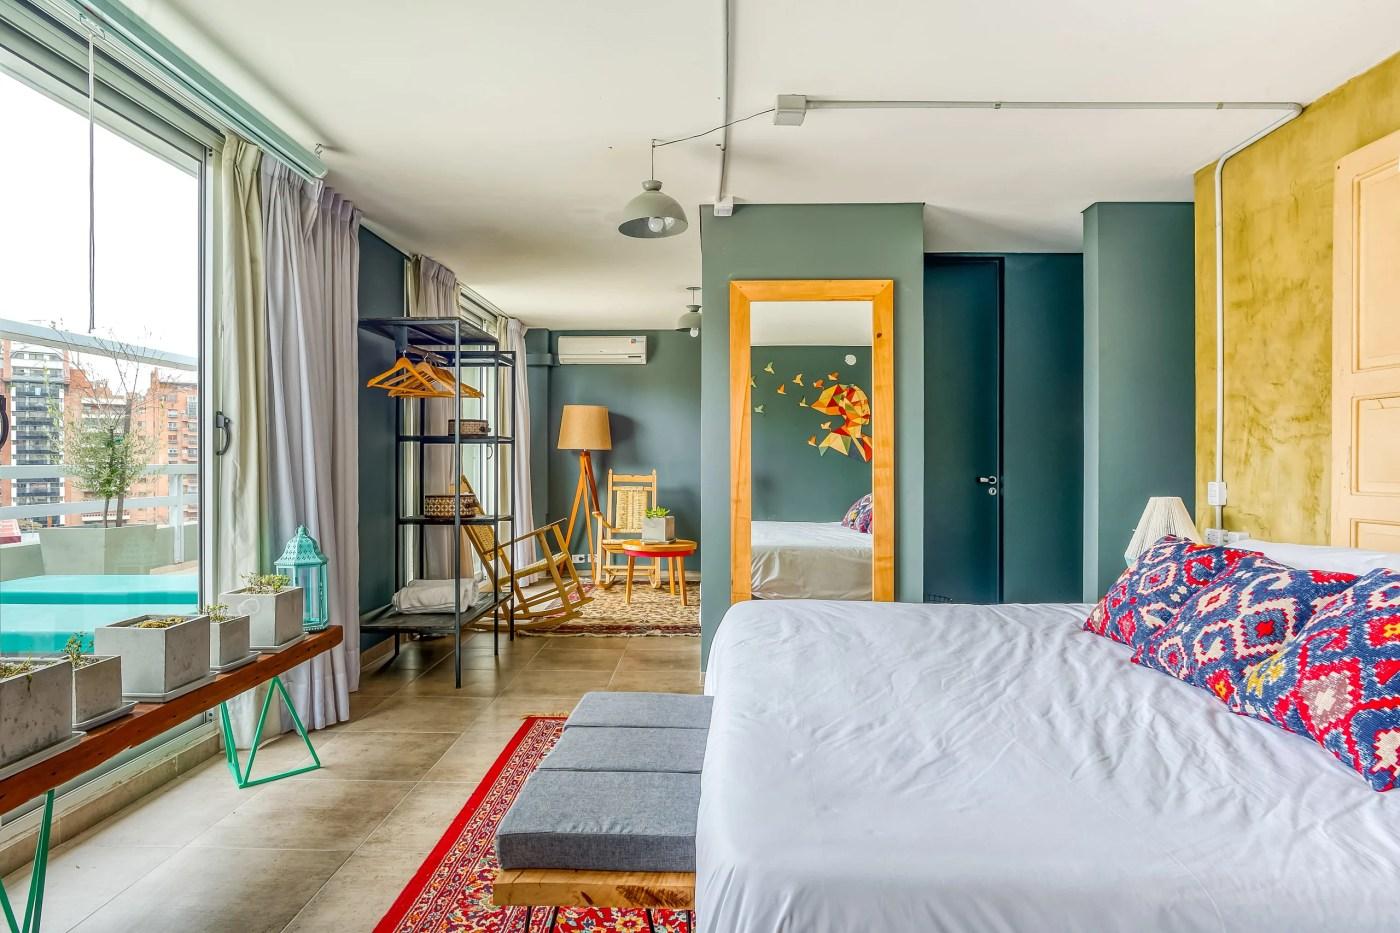 Selina Nueva Cordoba Argentina Hotel   The best way to stay   Selina